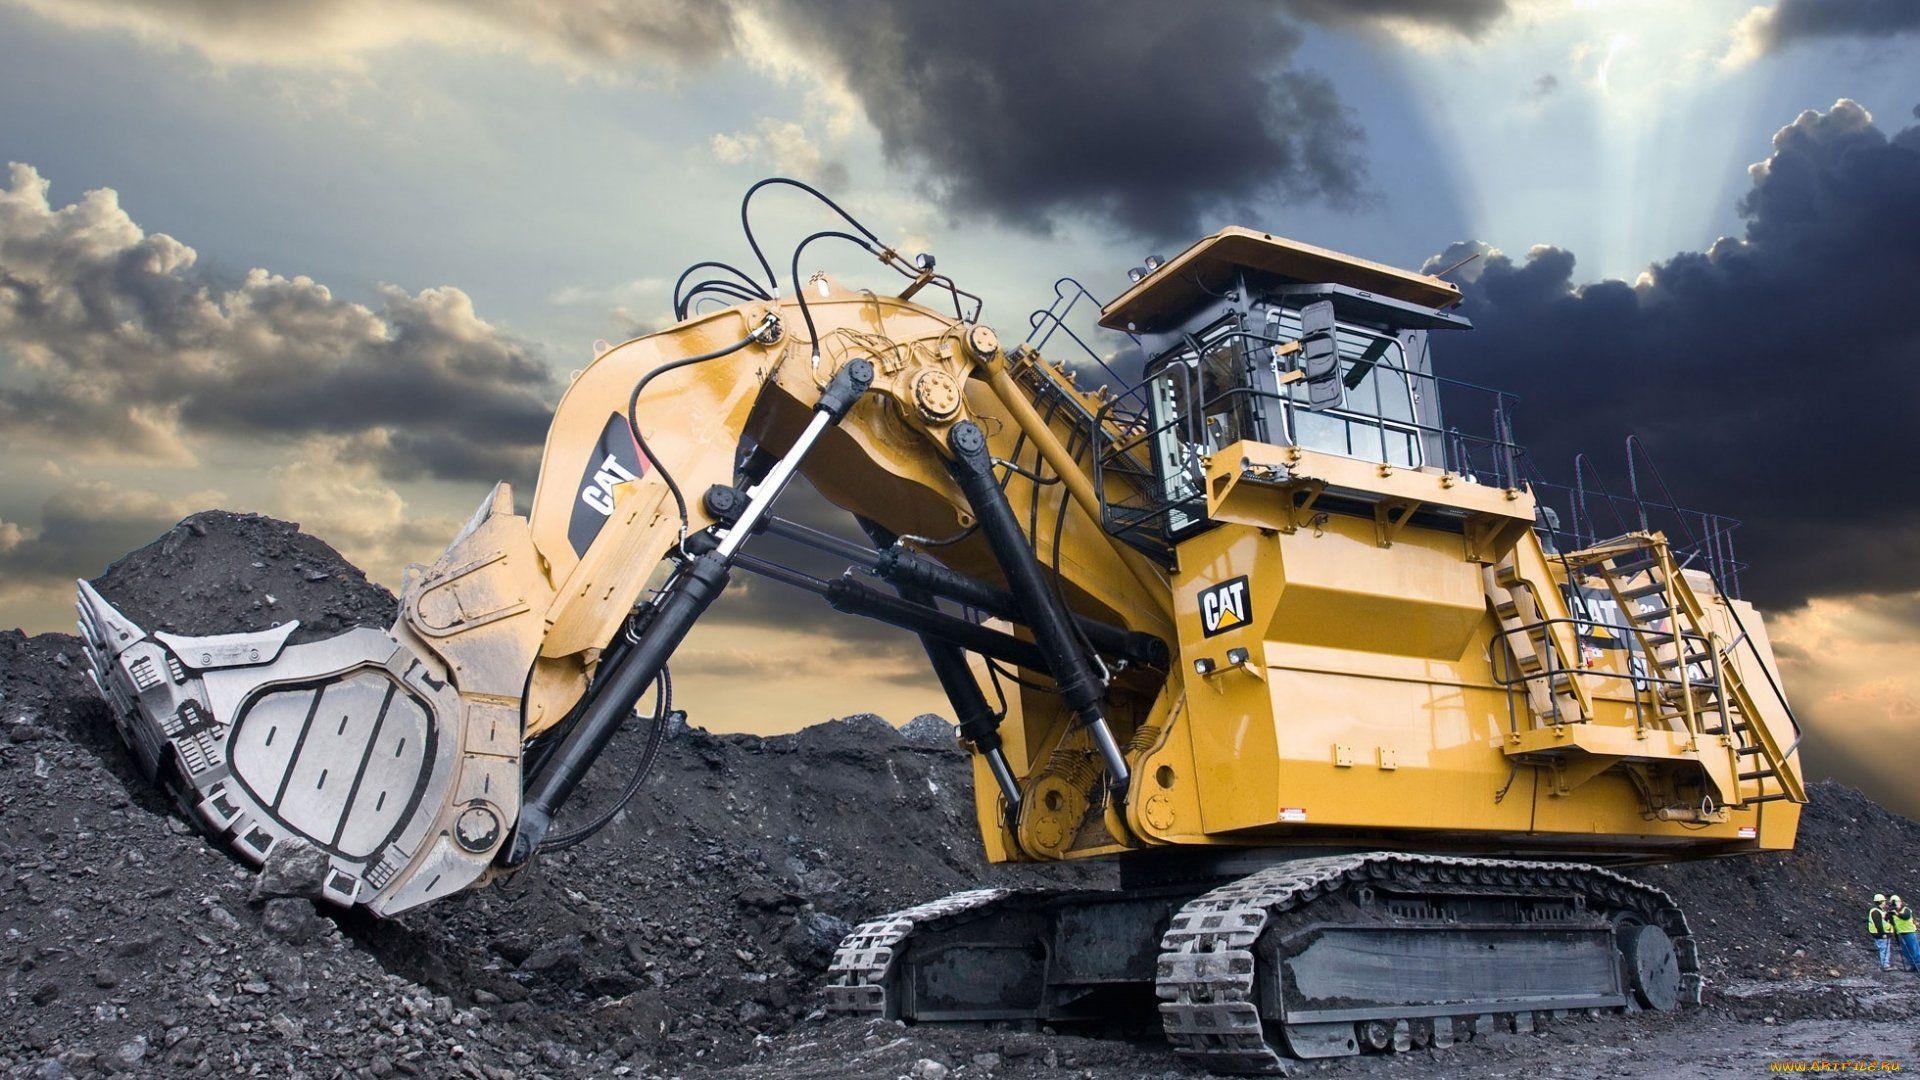 Caterpillar mining excavator Machinery Pinterest 1920x1080